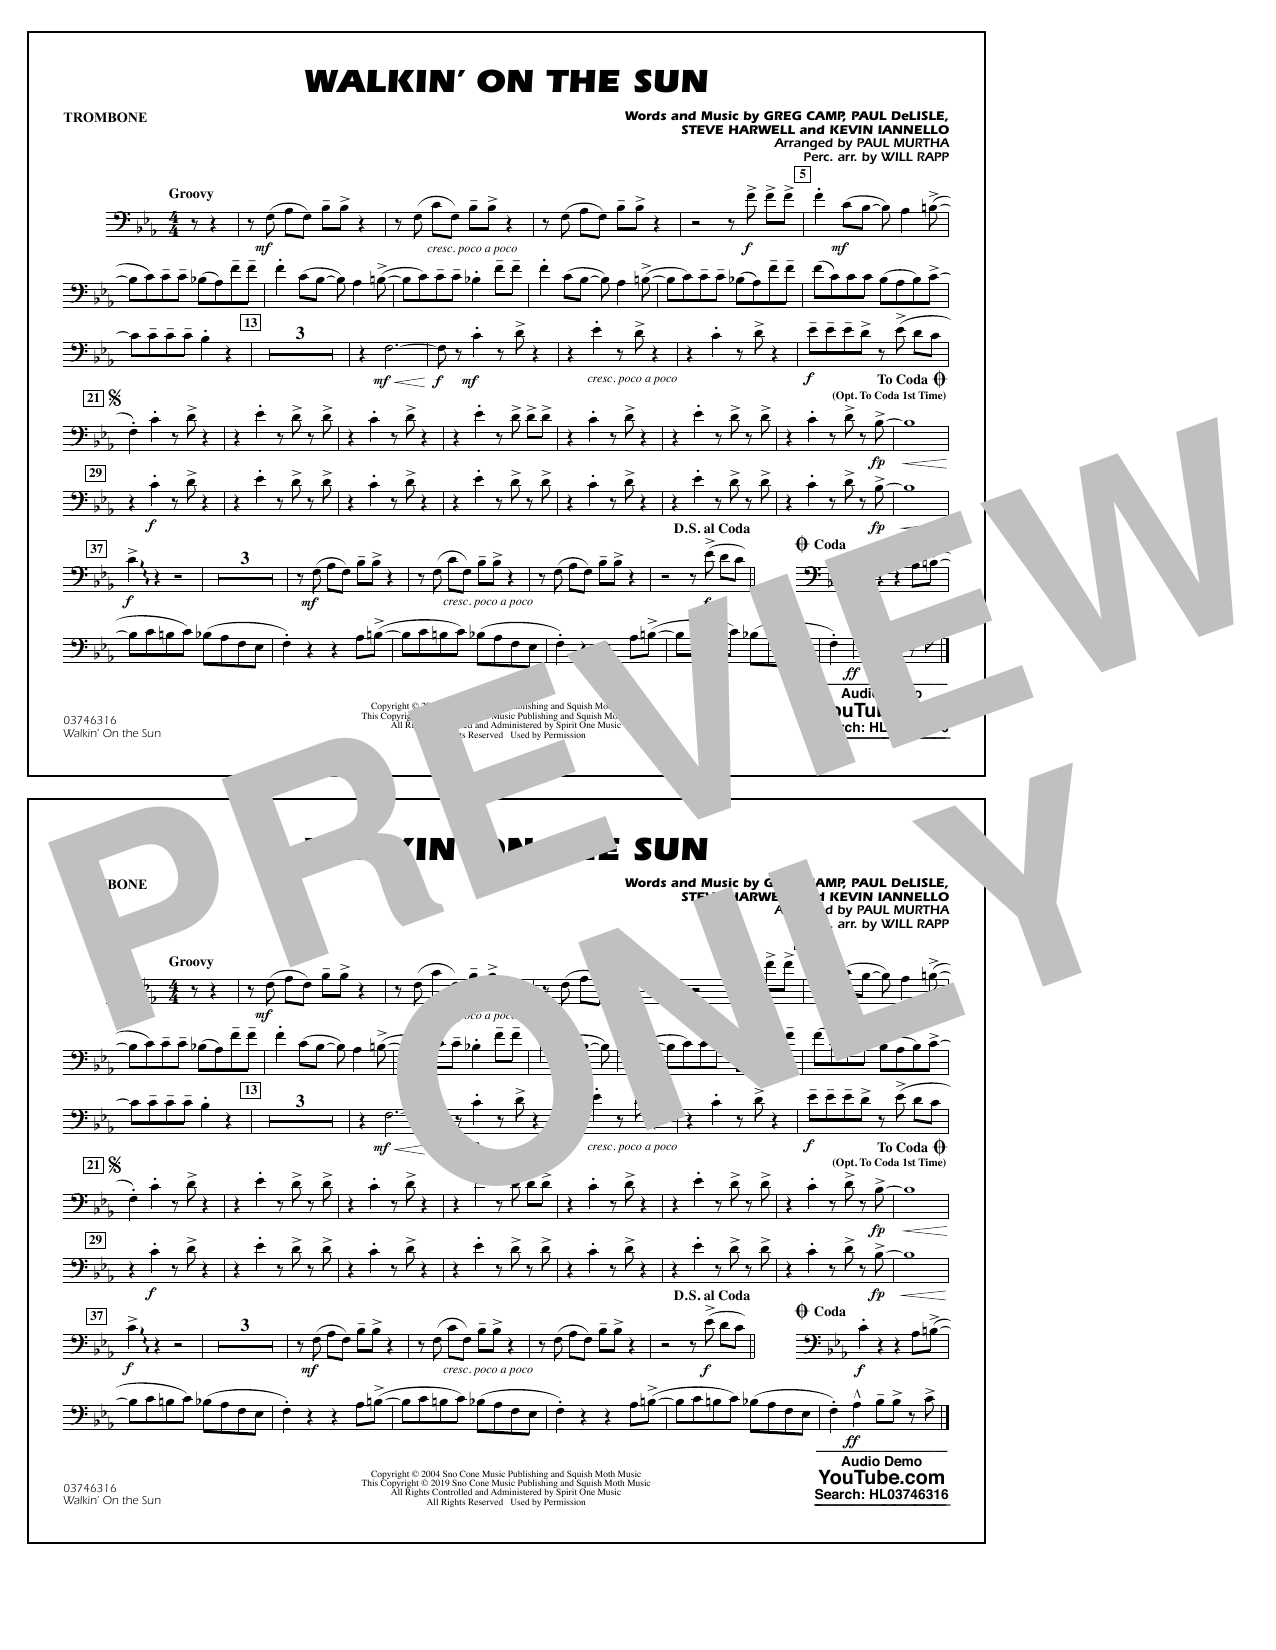 Walkin' on the Sun (arr. Paul Murtha) - Trombone (Marching Band)